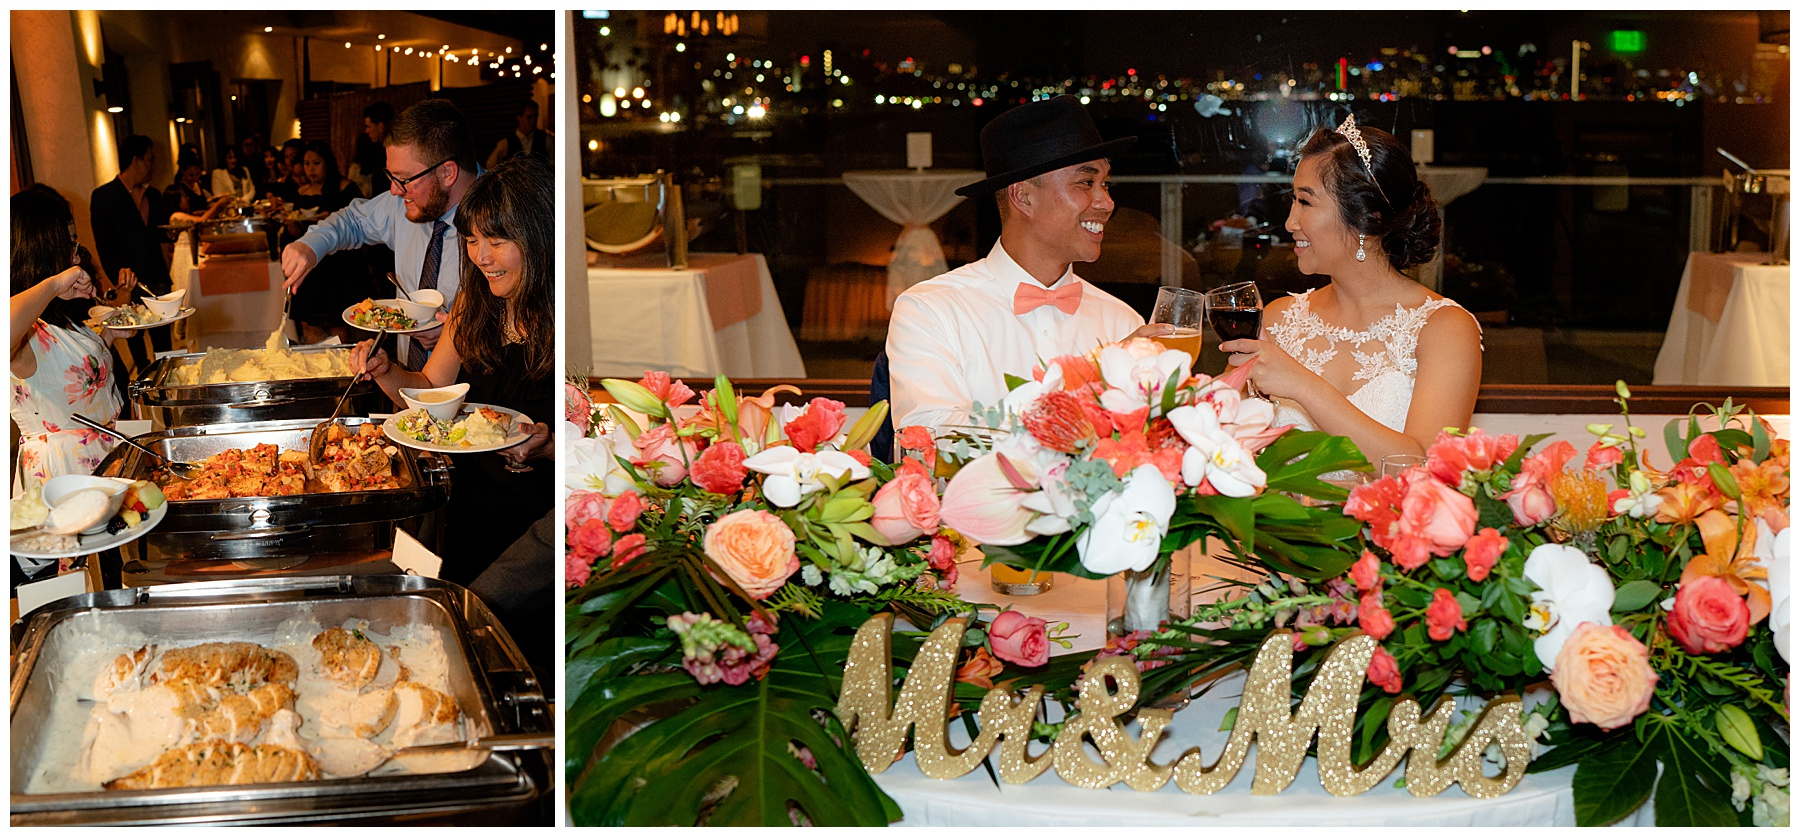 tom ham's lighthouse wedding toasts